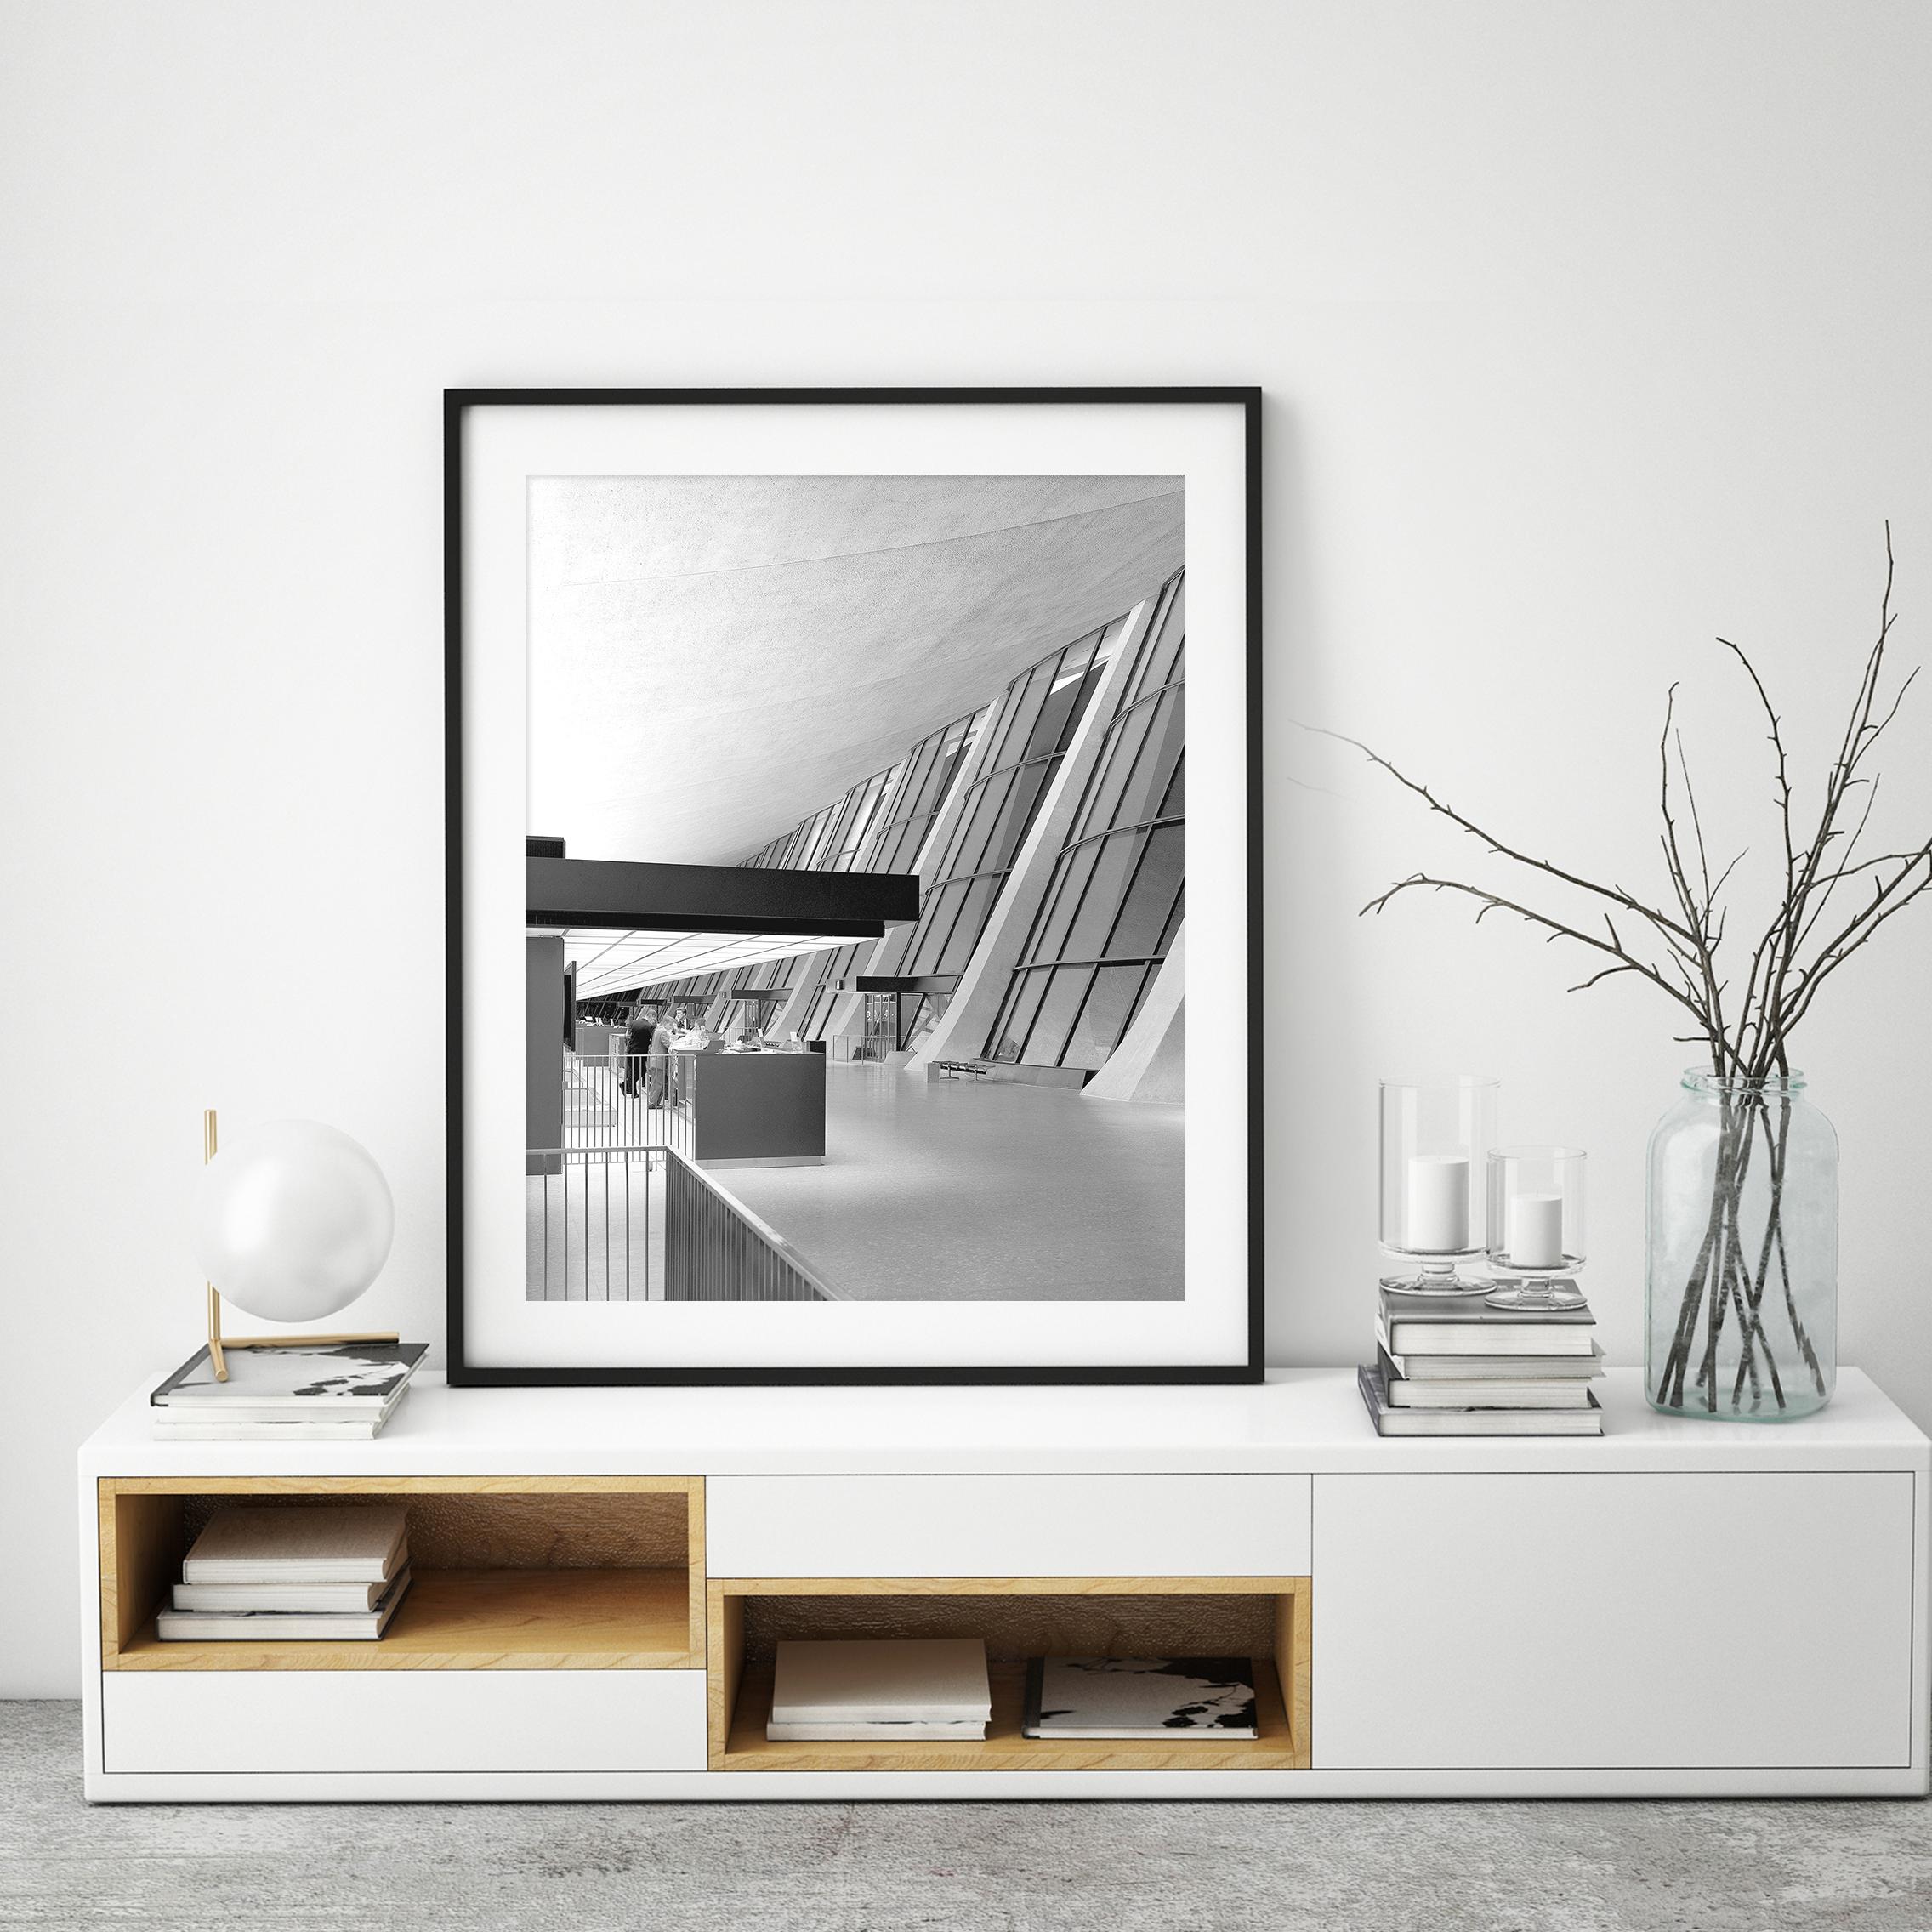 Frank Lloyd Wright's Fallingwater, designed in 1935.